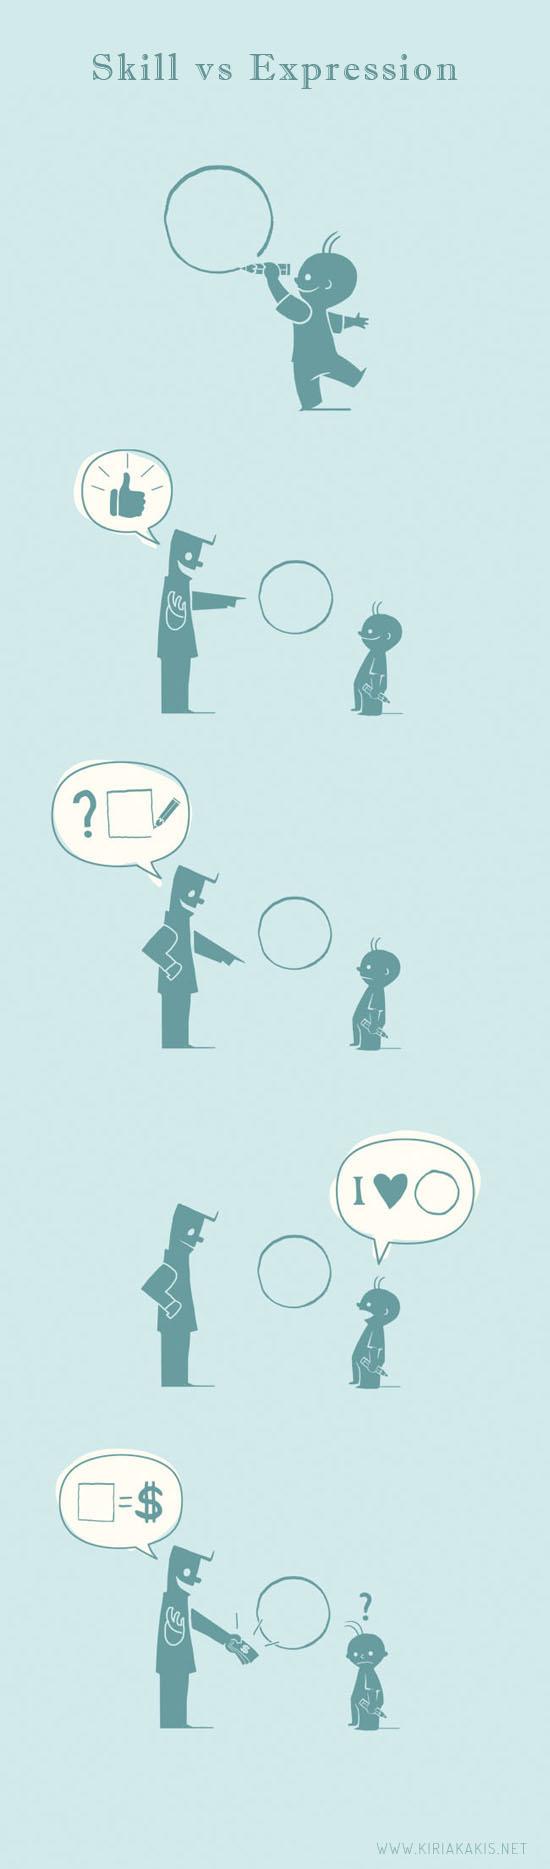 skill-vs-expression